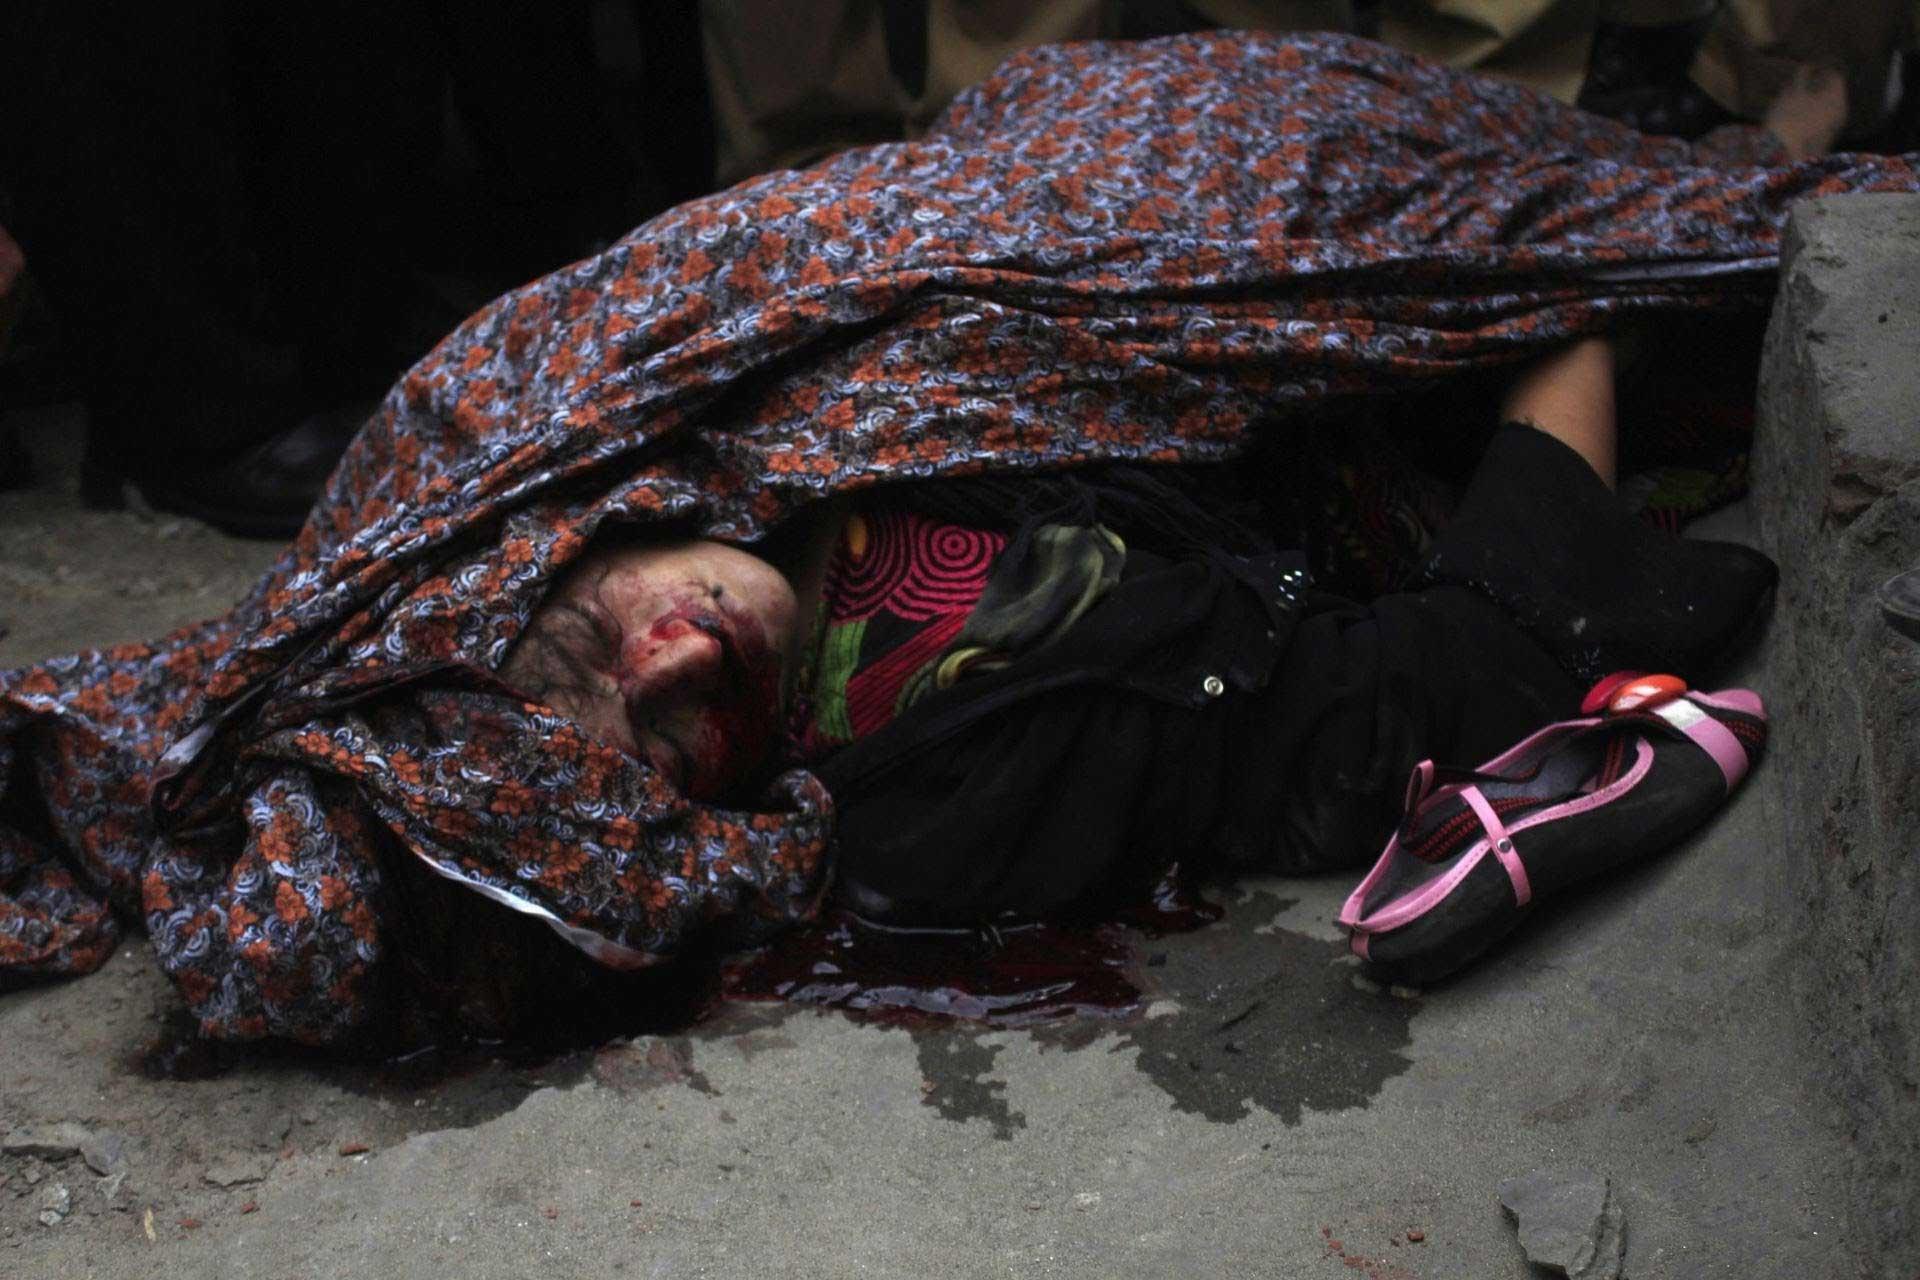 women-in-pakistan-pregnant-stoned-to-death-portrait